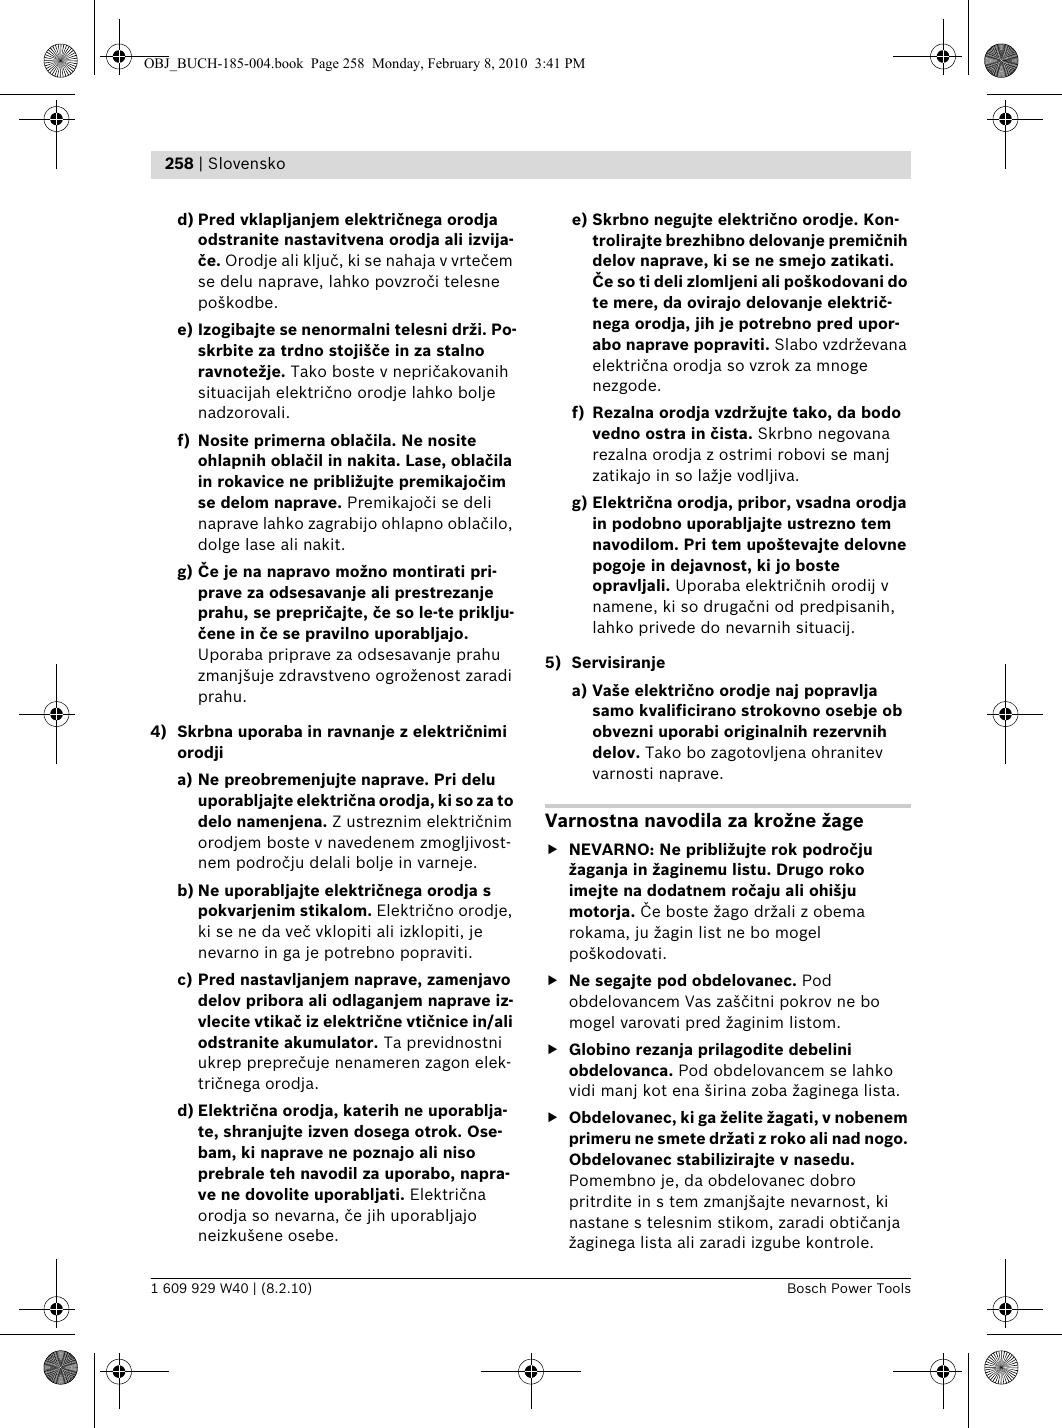 Svit Notes Ece 6th Sem